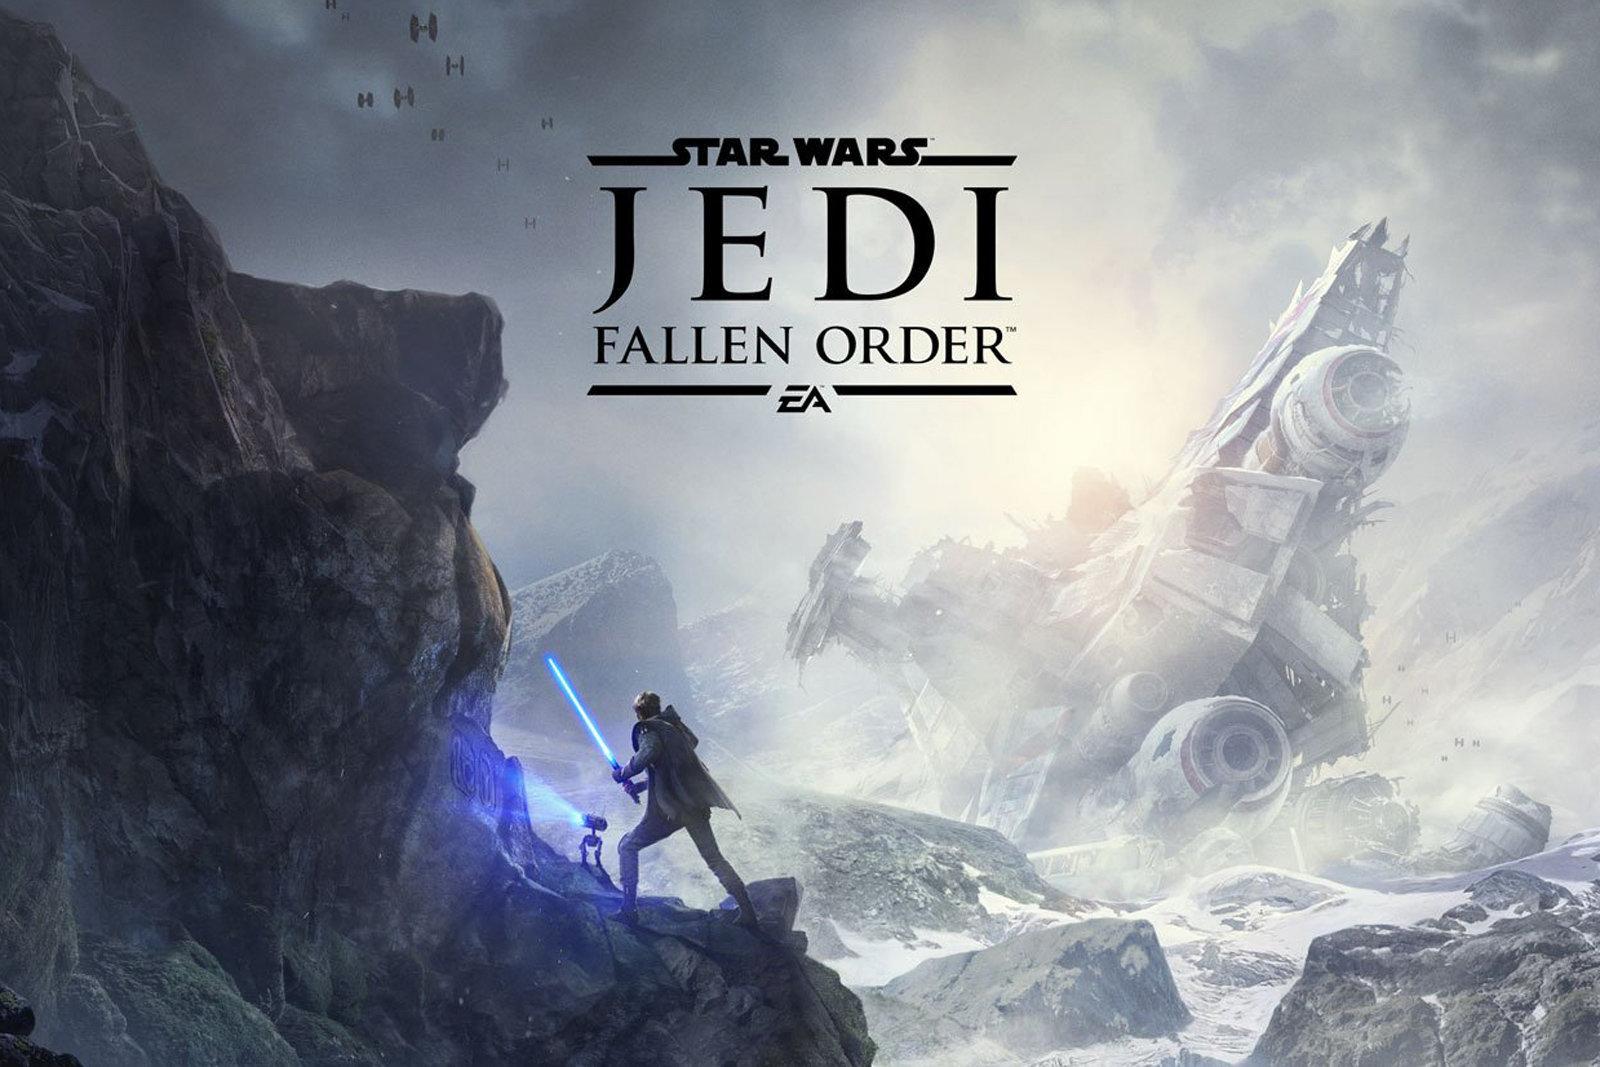 Outro trailer de lançamento para Star Wars Jedi: Fallen Order